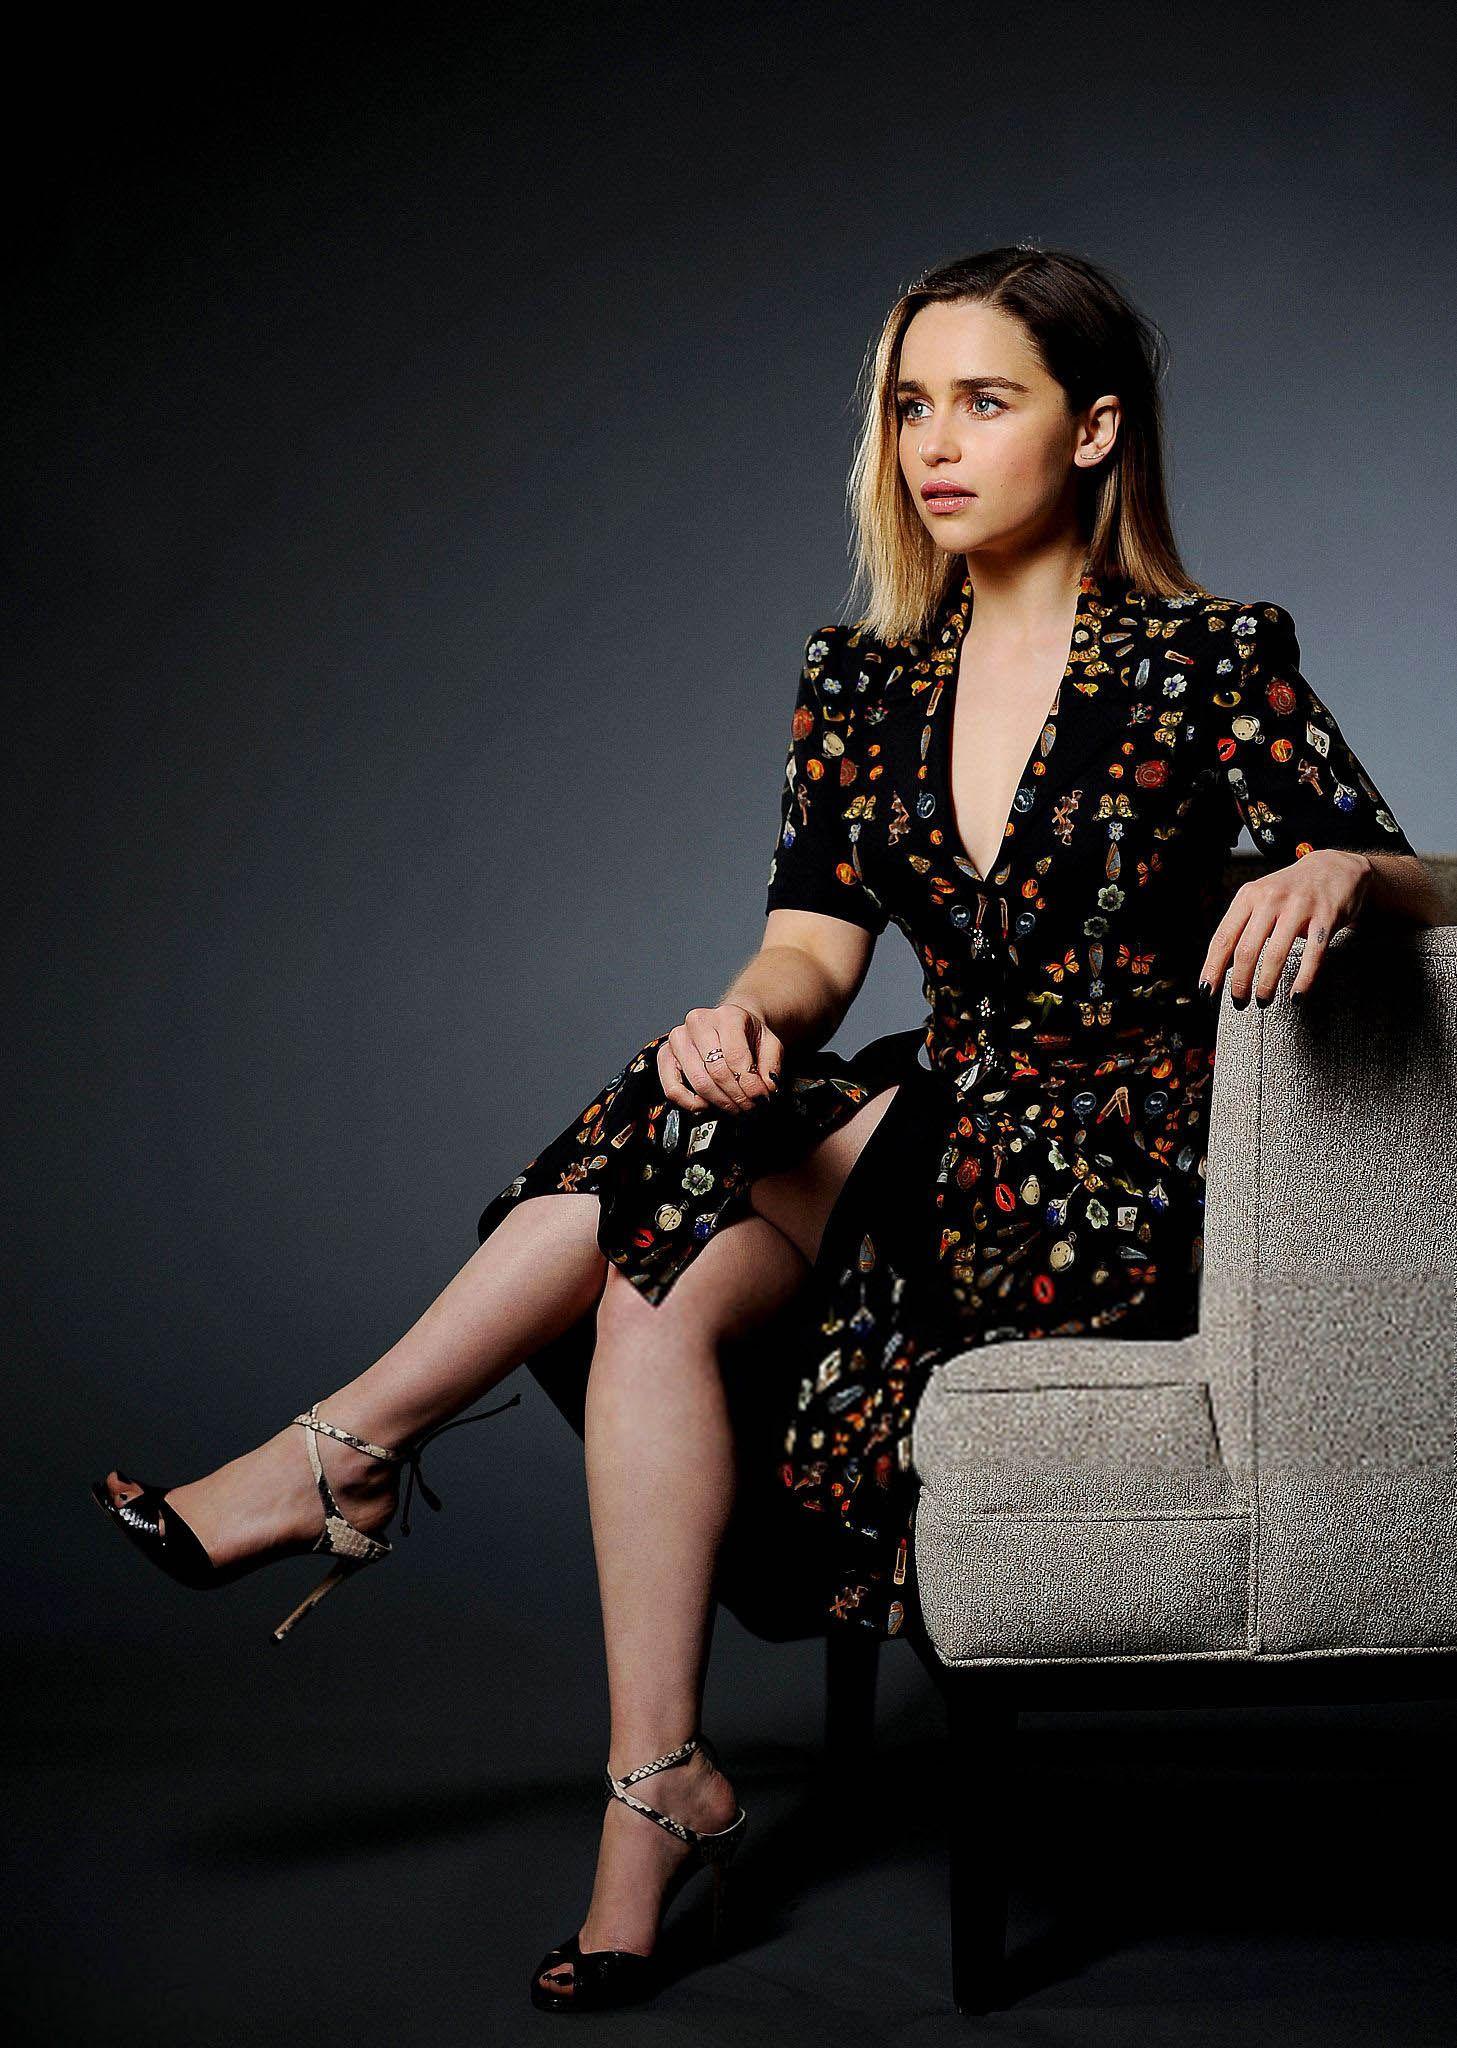 1000 images about emilia clarke on pinterest emilia - 1000 Images About Emilia Clarke On Pinterest Glamour Daenerys Targaryen And Game Of Thrones